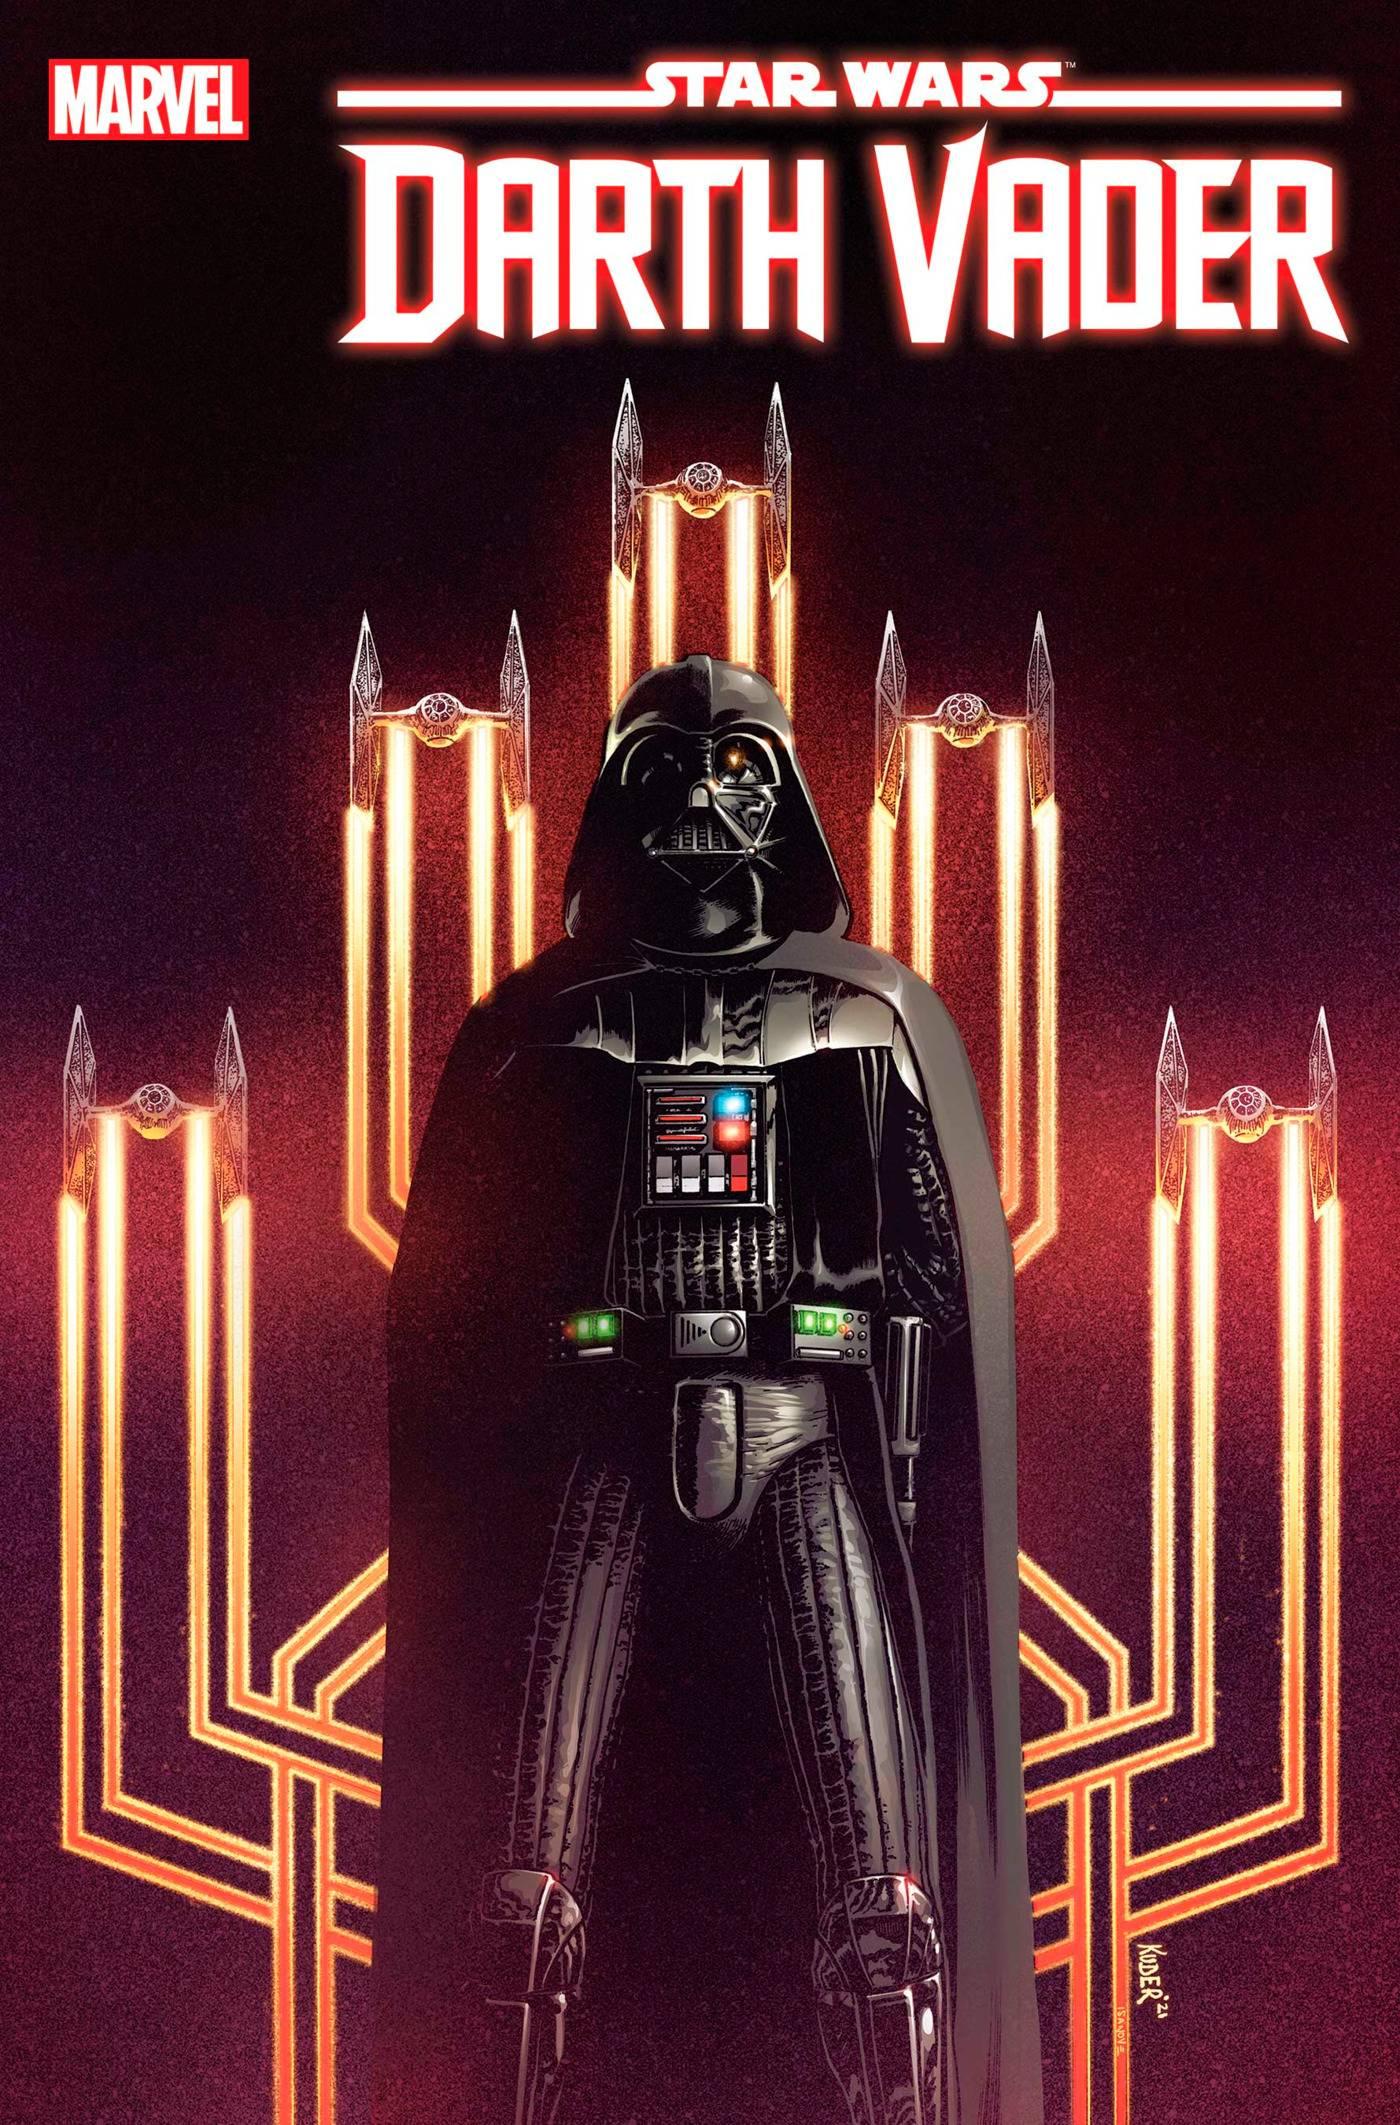 Star Wars Darth Vader #18 Cover A Regular Aaron Kuder Cover